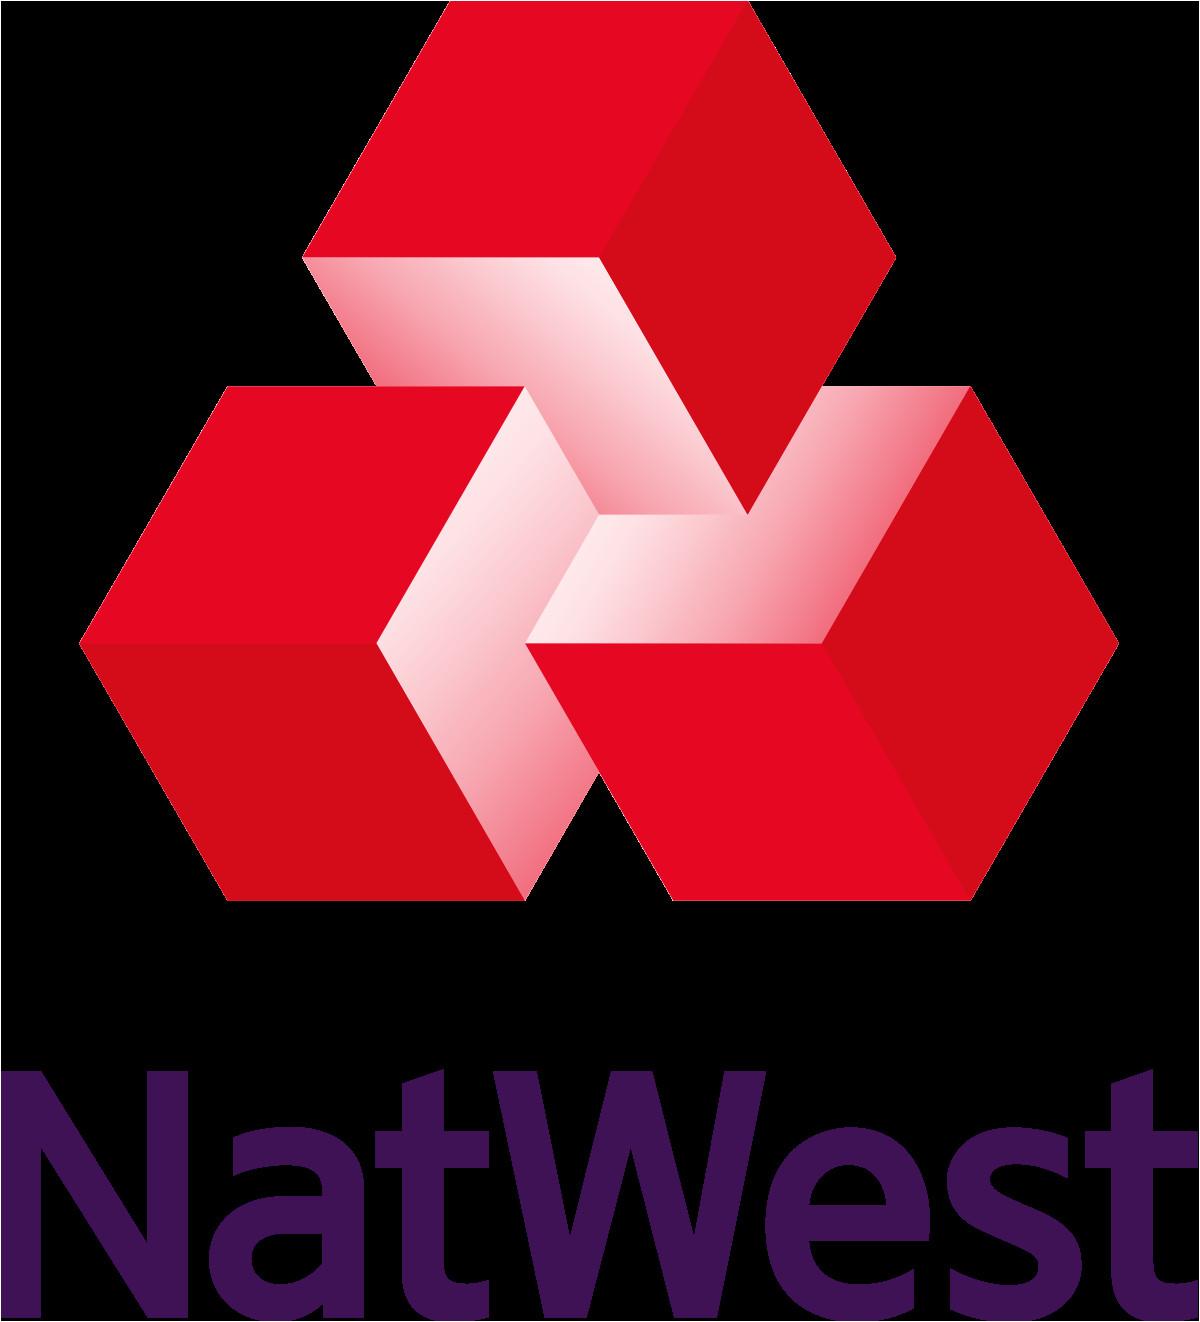 1200px natwest logo svg png